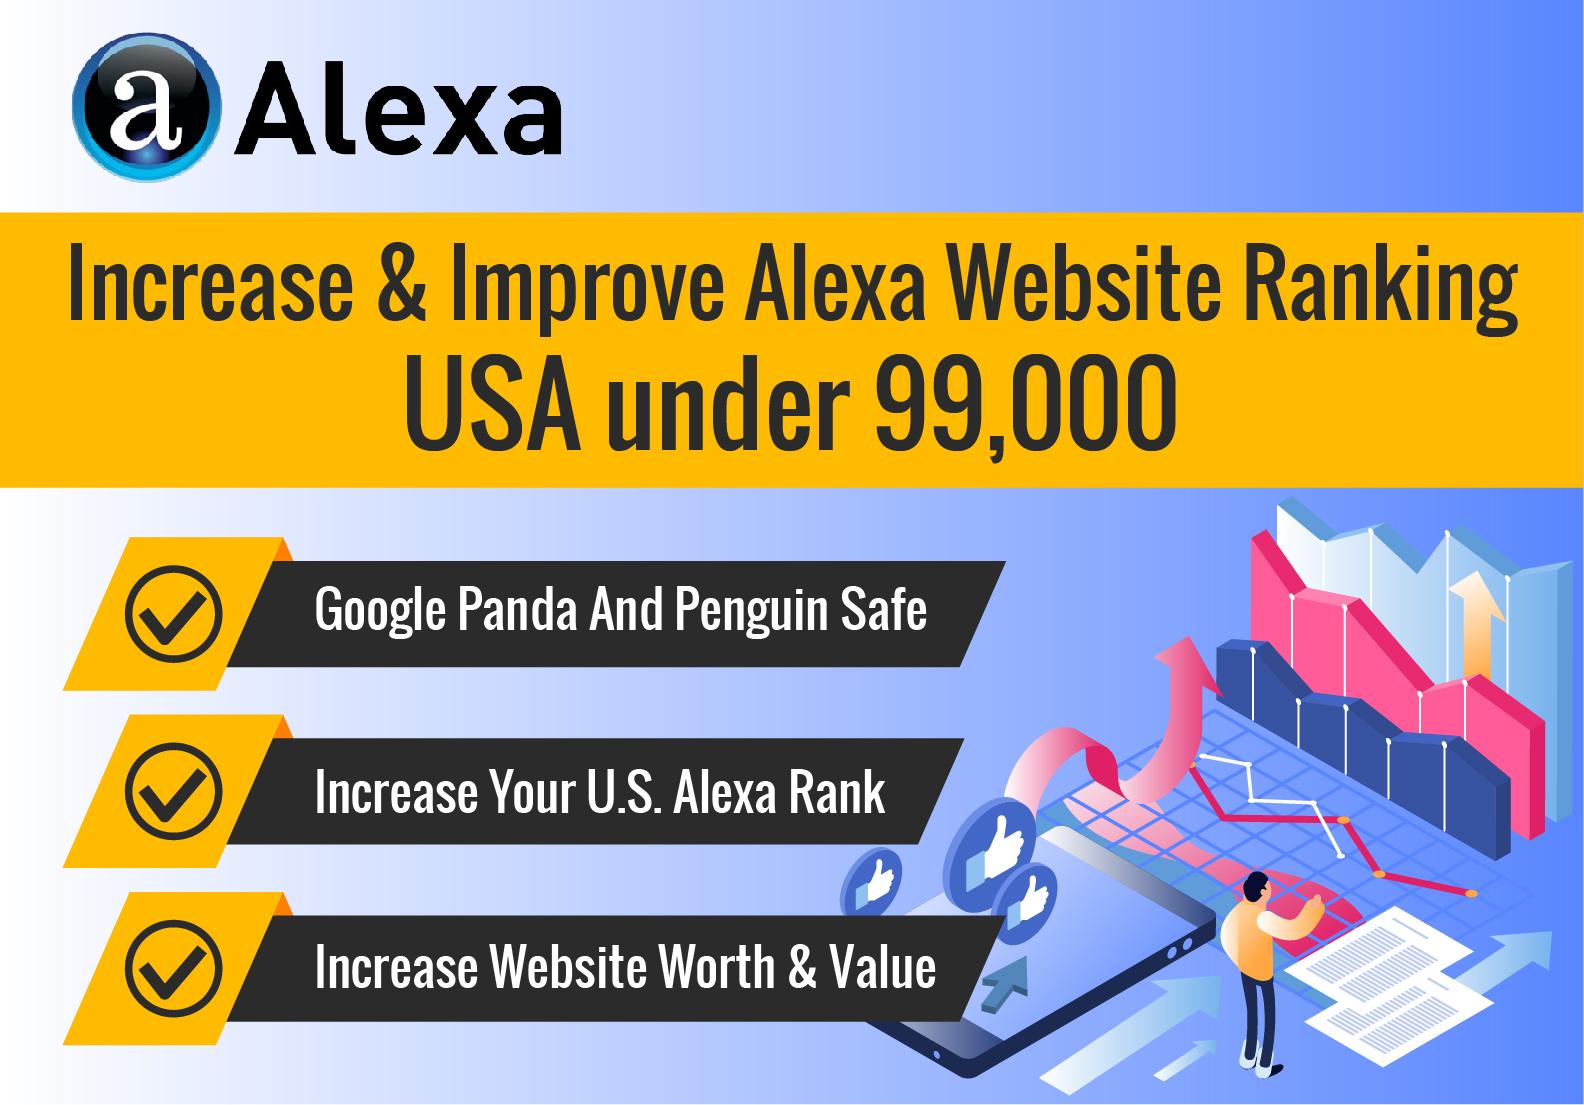 Increase & Improve Alexa Website Ranking - USA under 99,000